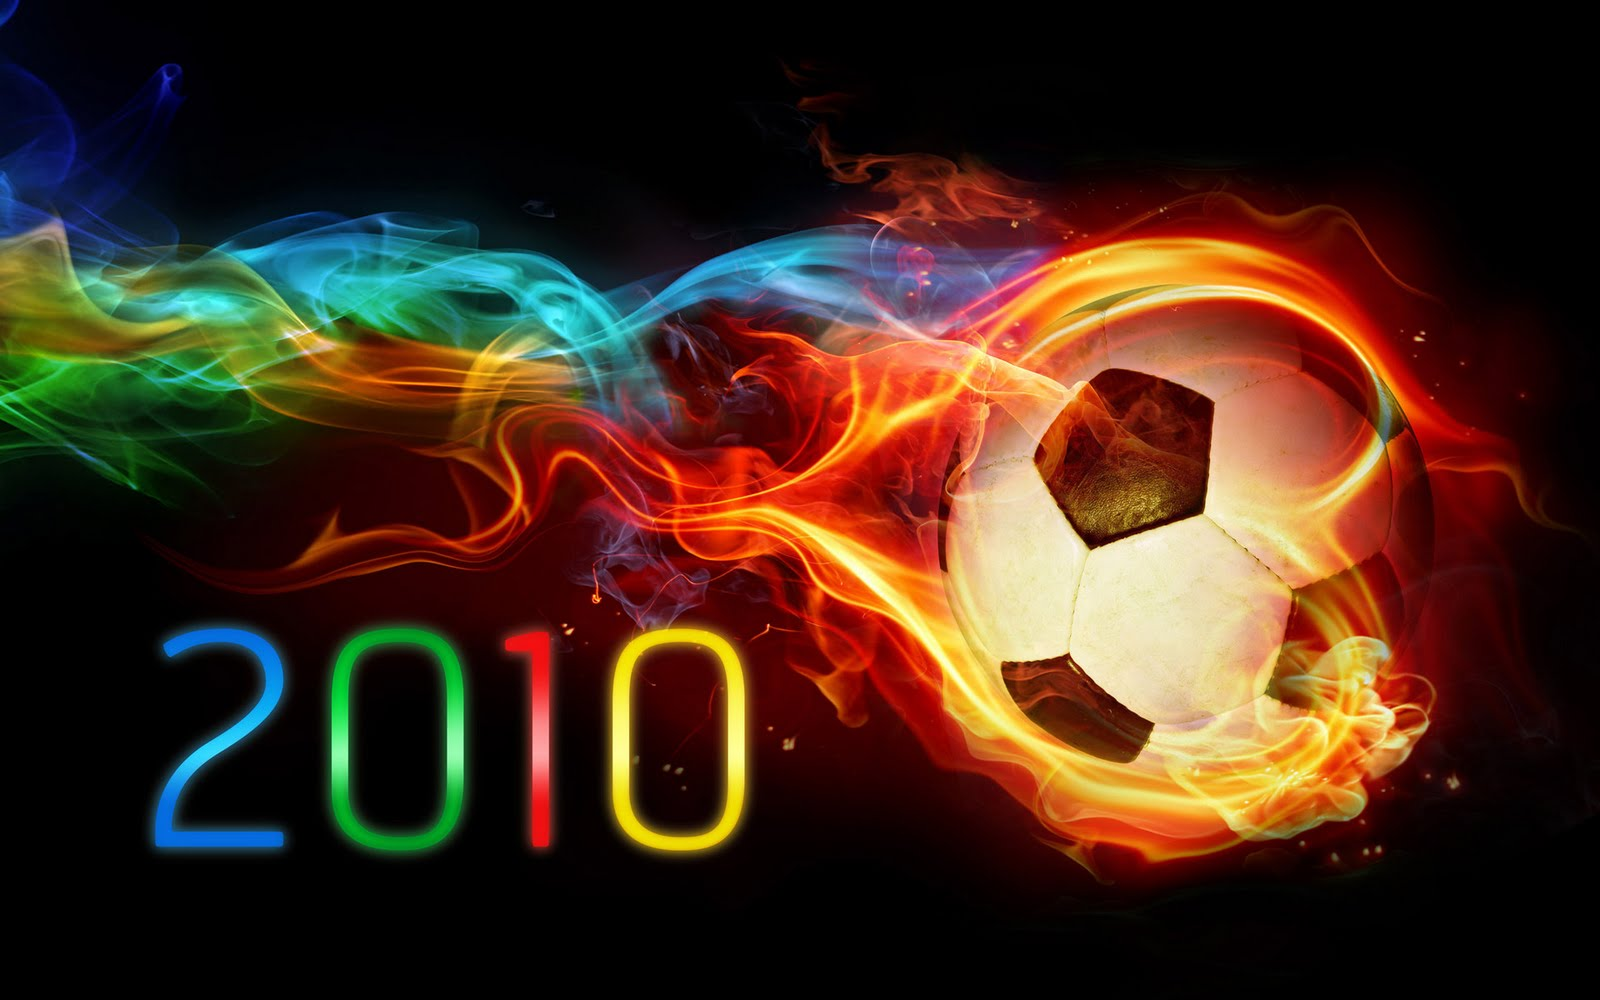 http://2.bp.blogspot.com/_JMdl-D4Jq6w/TDn8_Tj5dKI/AAAAAAAANGU/gdnAM2zYFeE/s1600/HD_Soccer_10.jpg